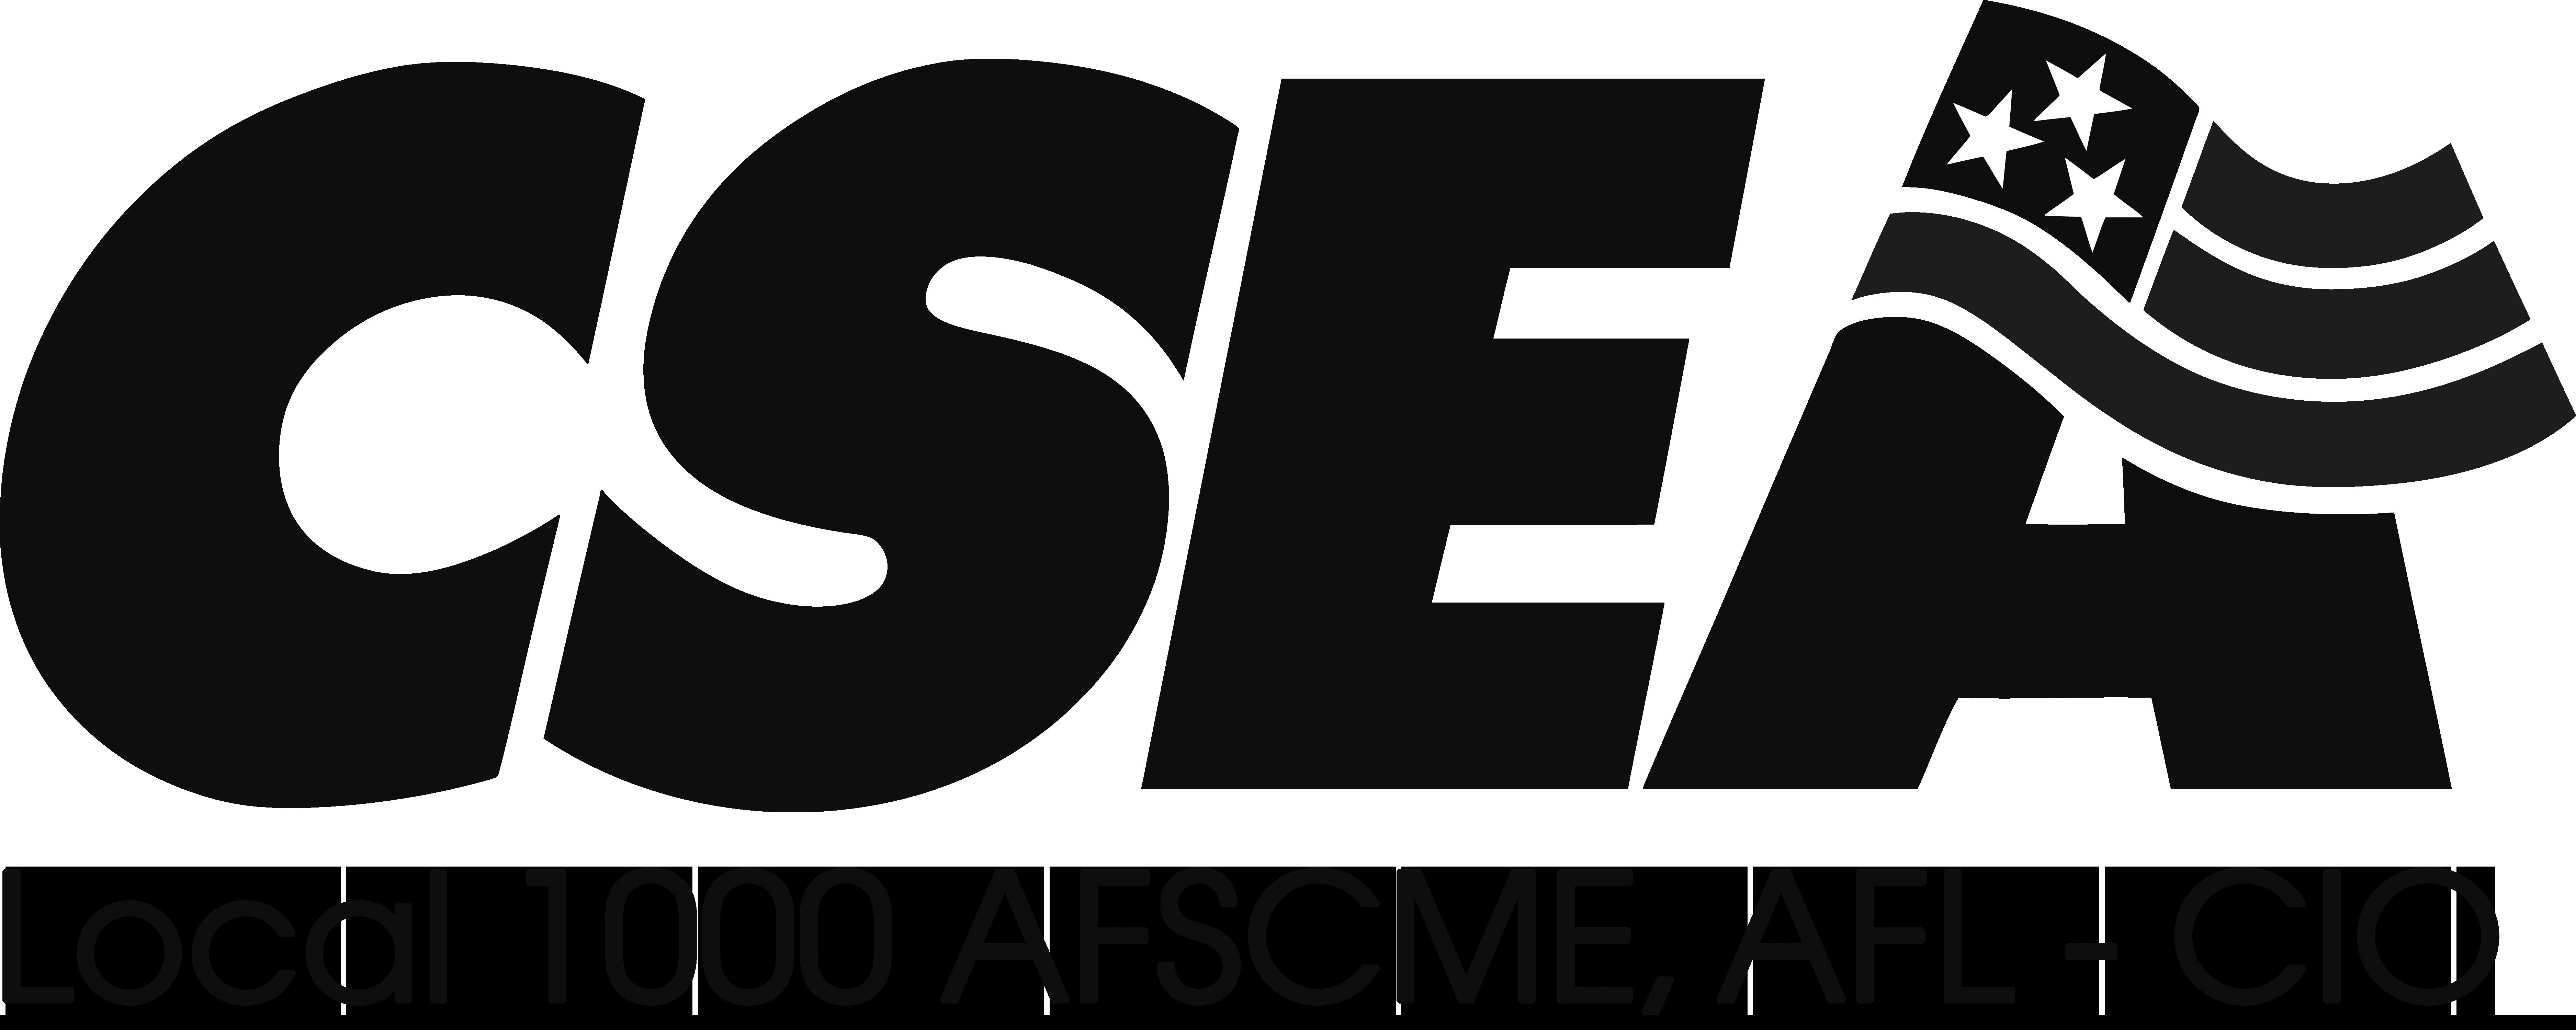 CSEA Local 1000 logo